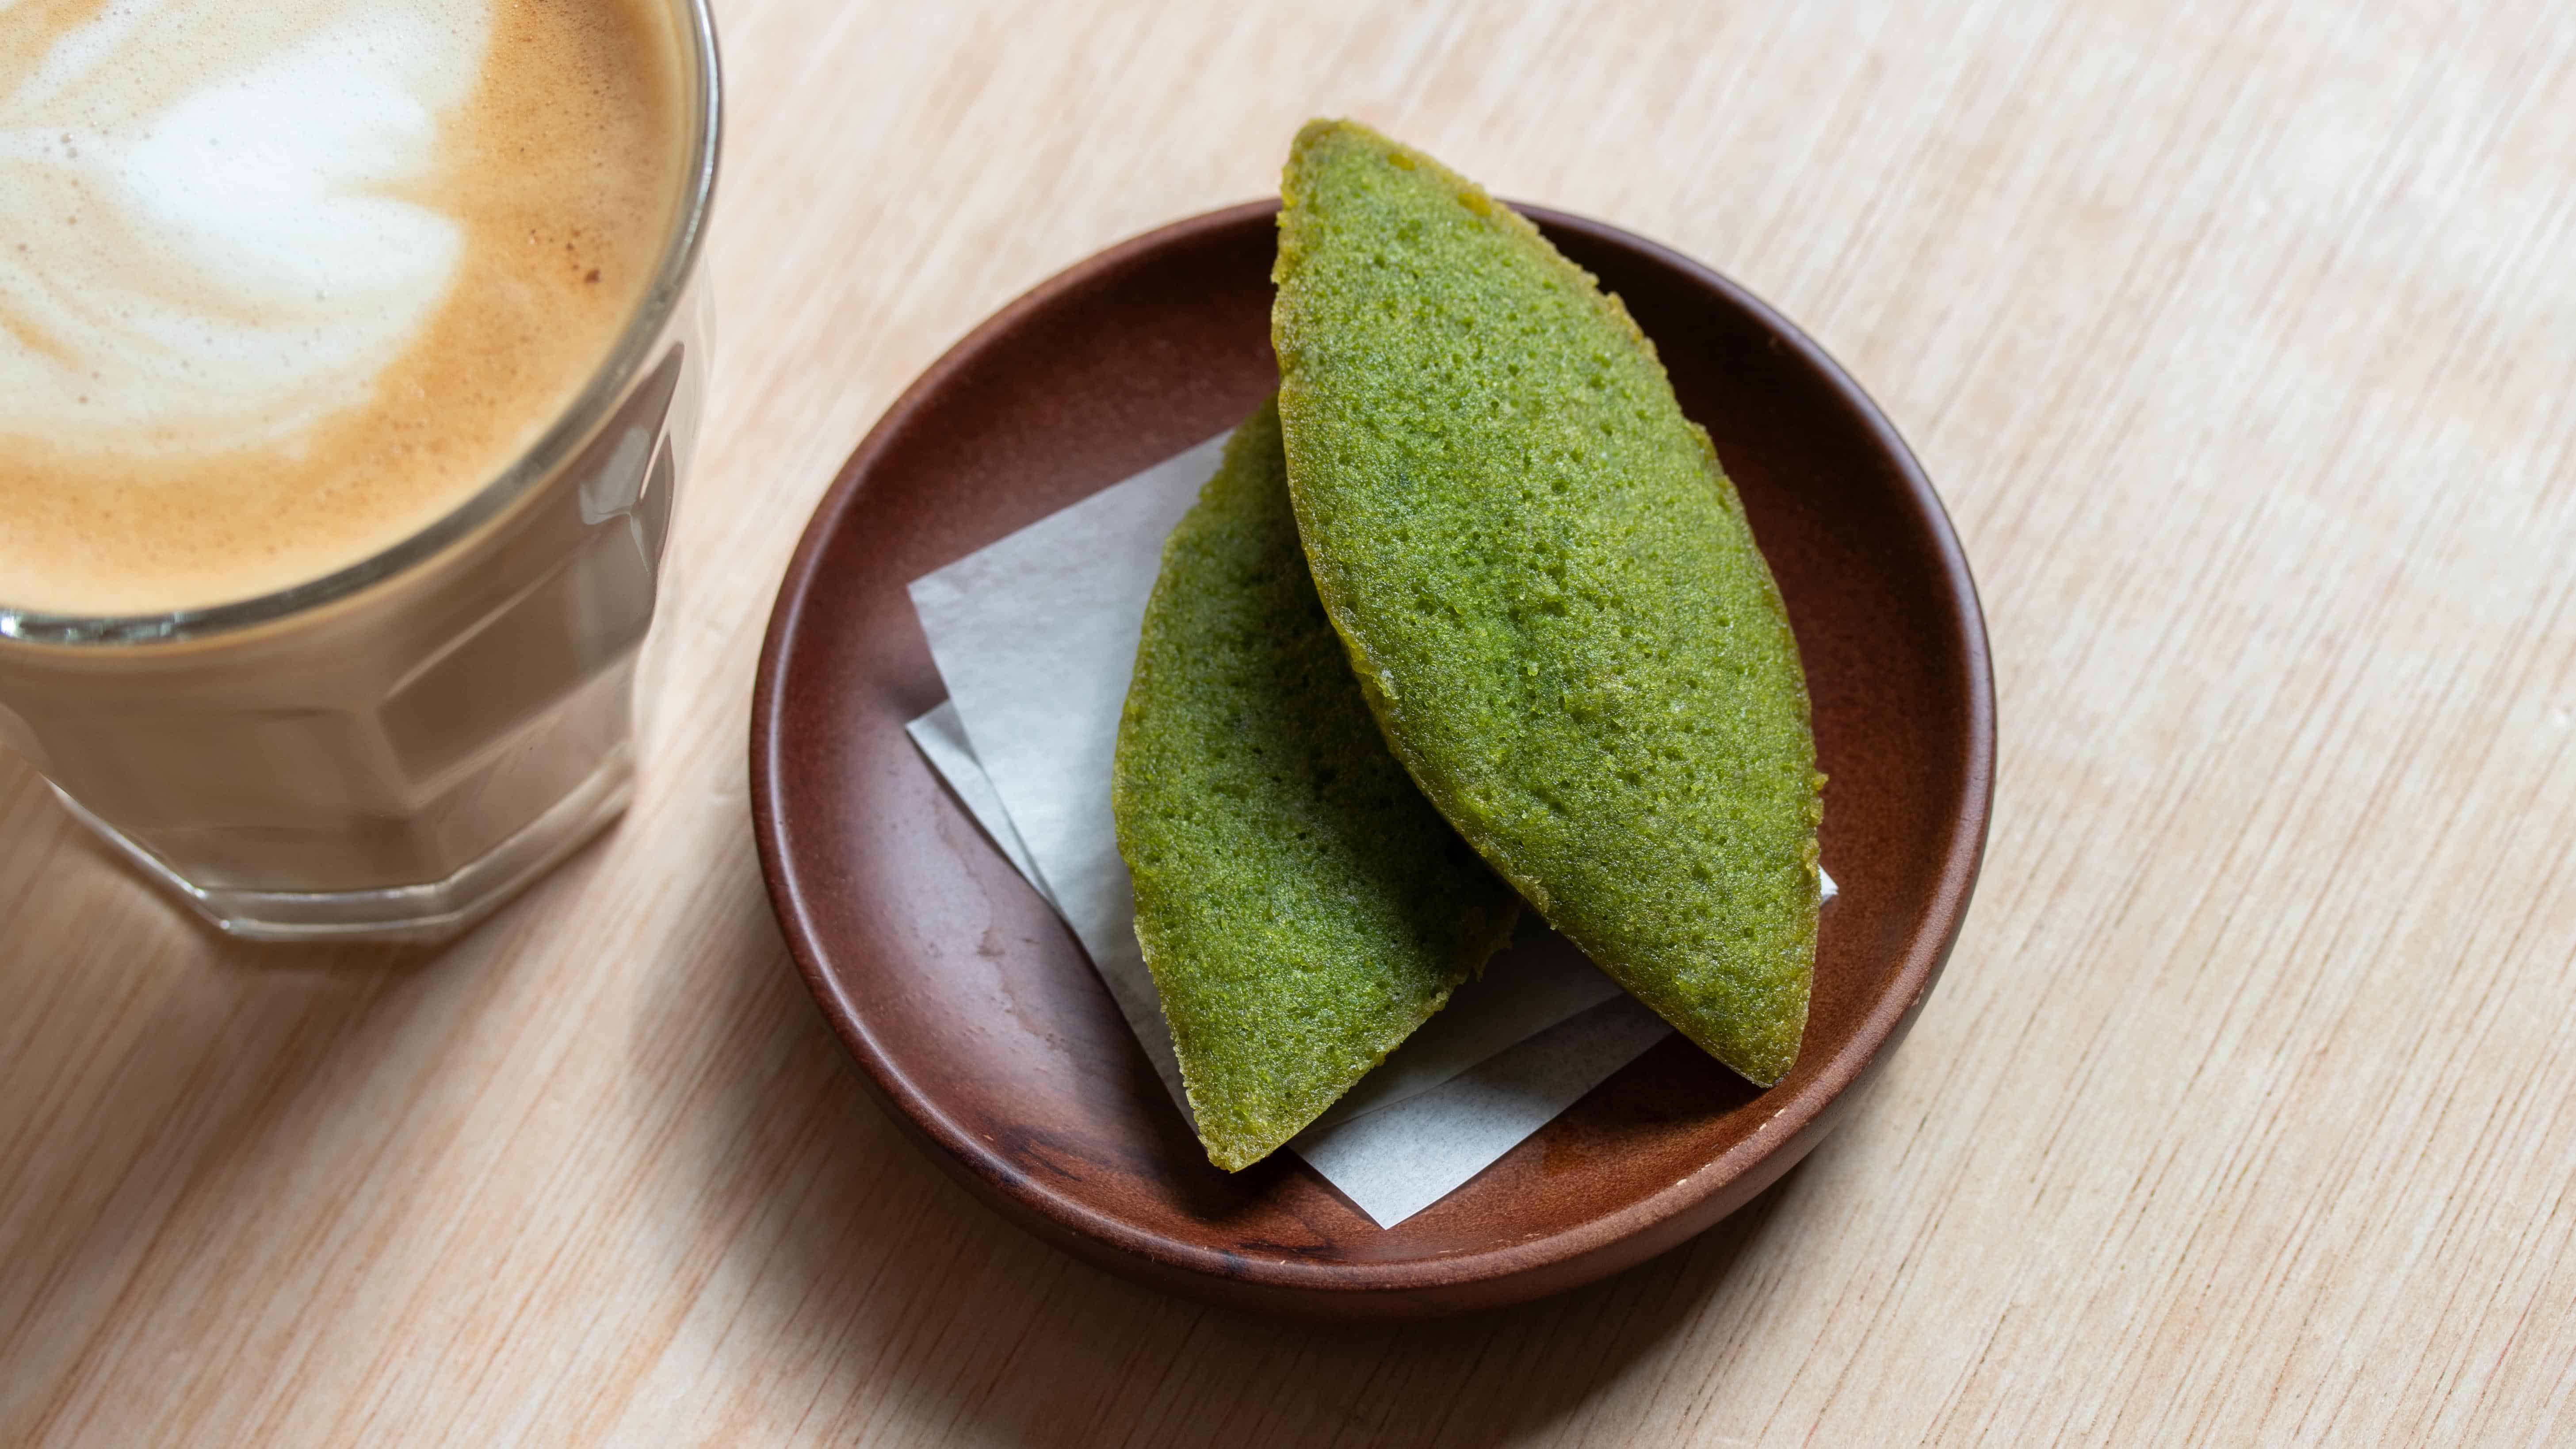 matcha green tea financiers served with hot tea